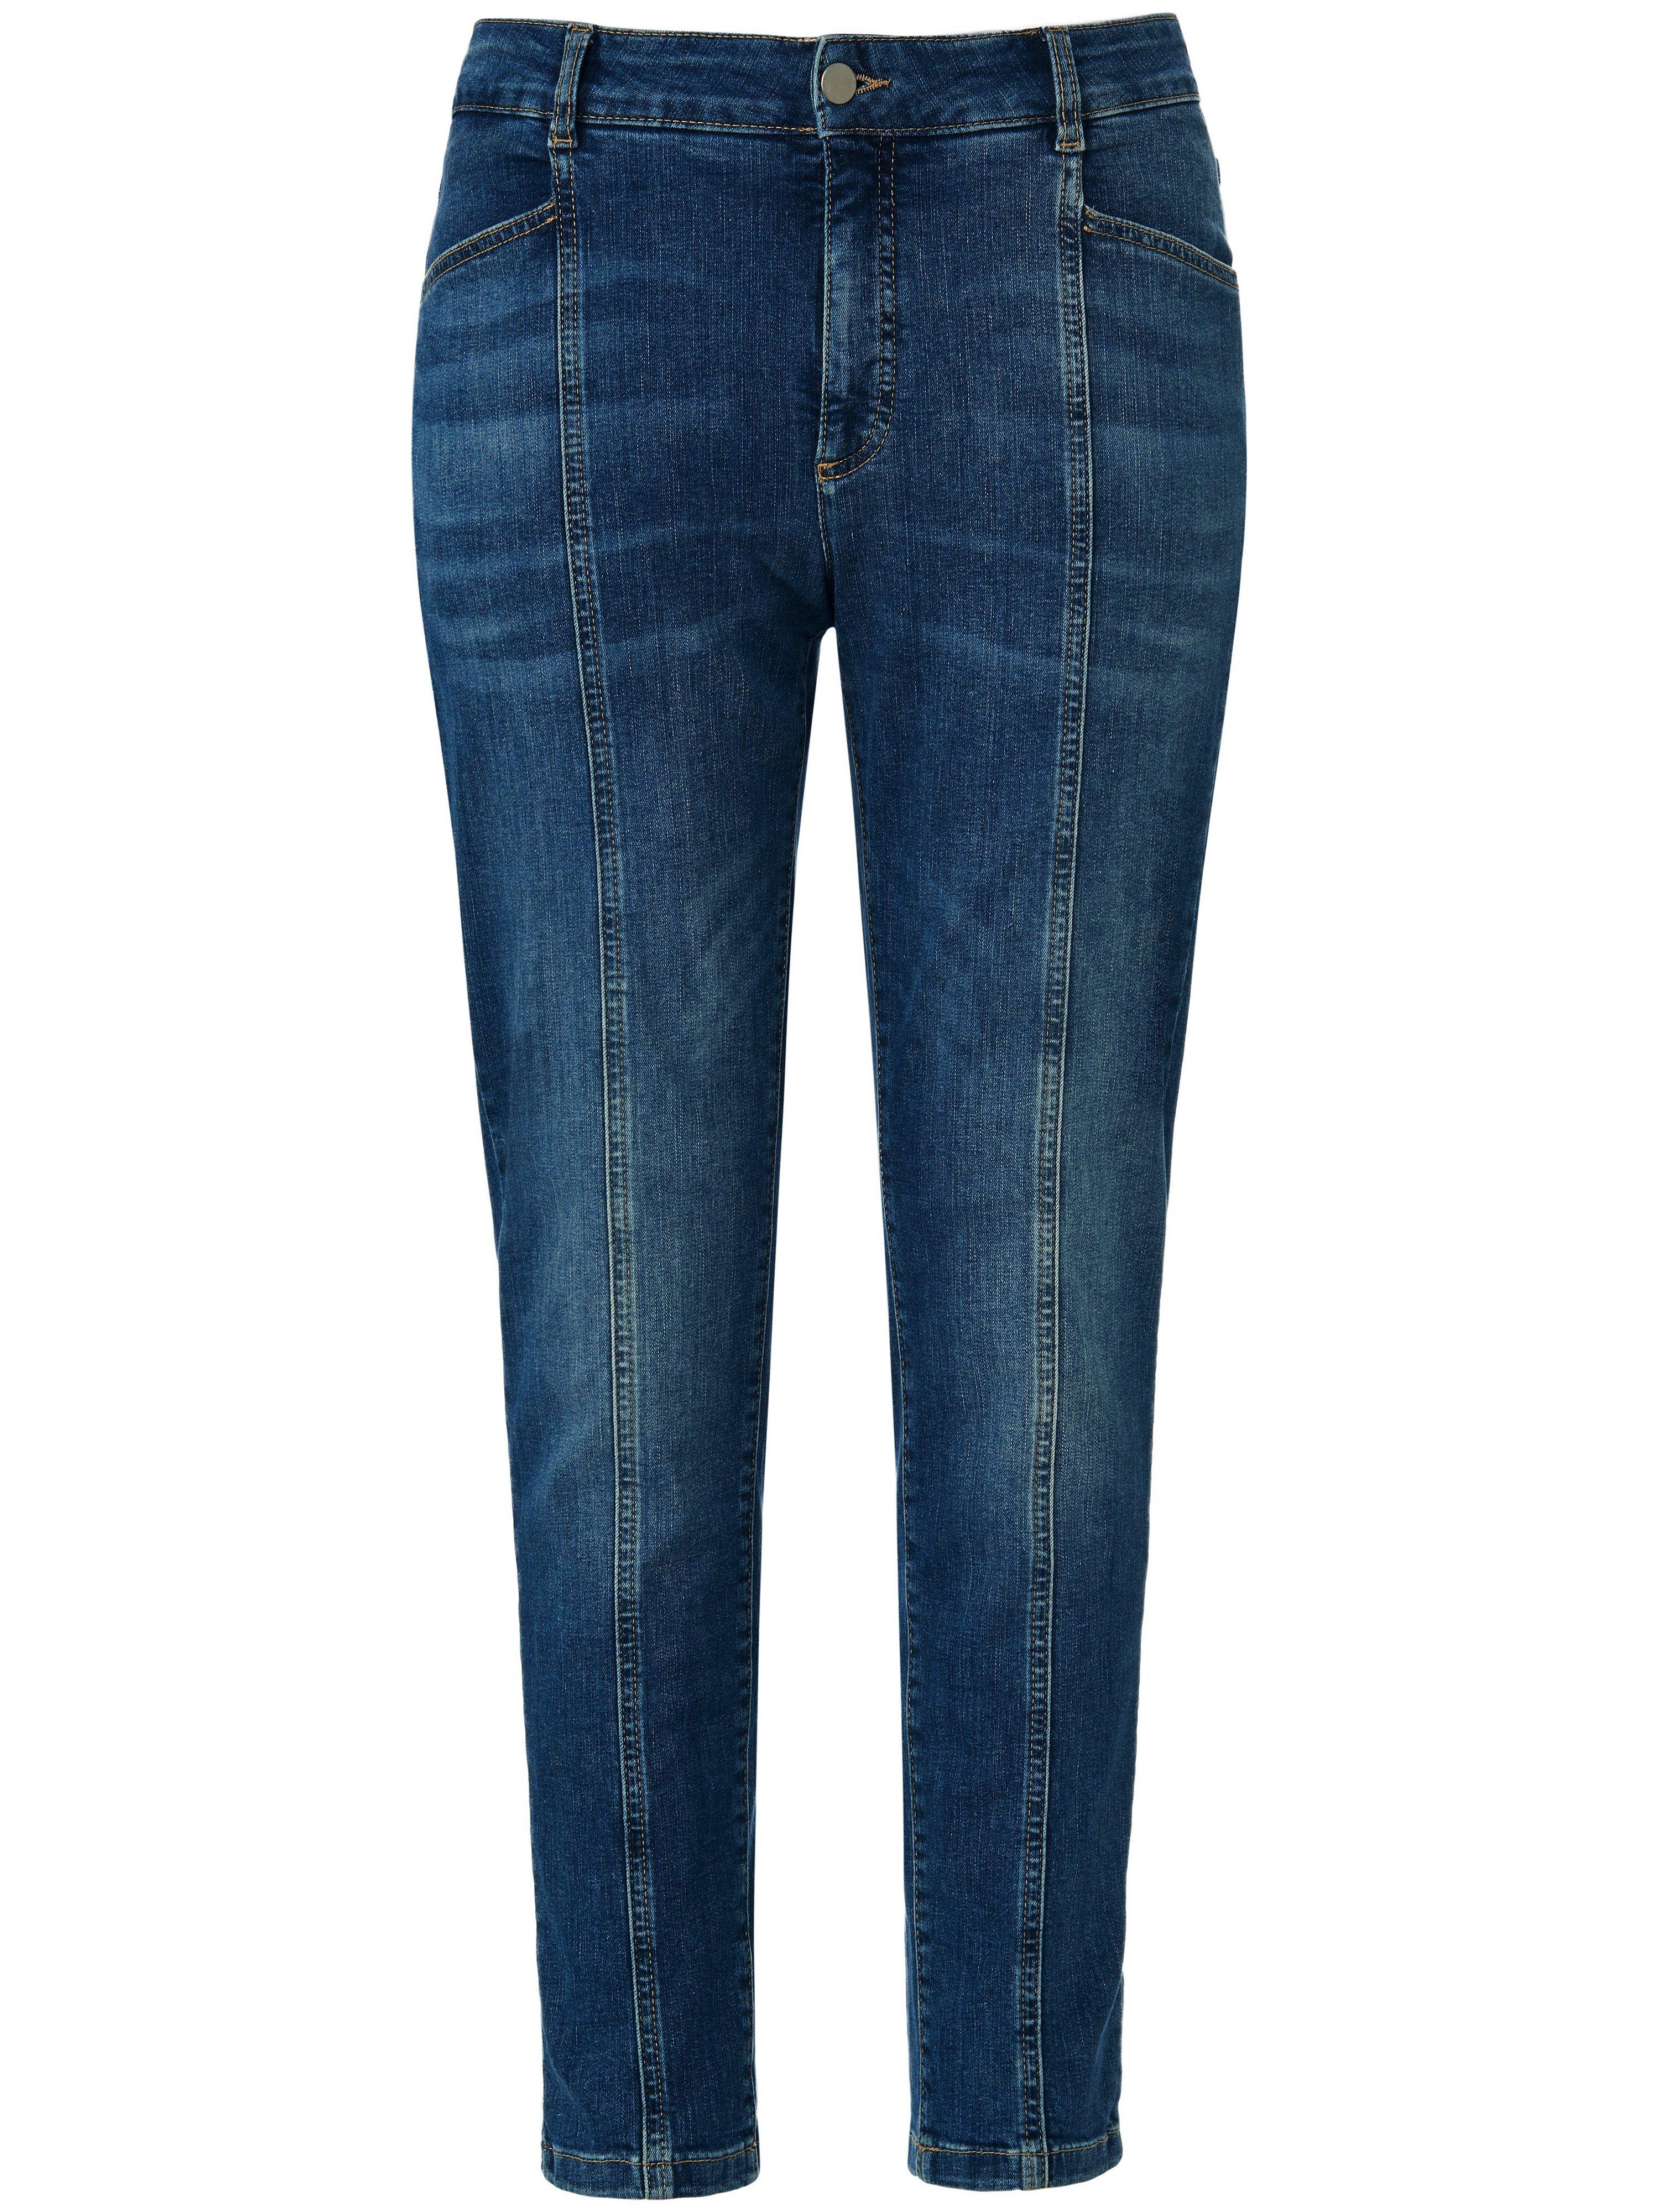 7/8-jeans in 5-pocketsmodel smalle pijpen Van Emilia Lay denim